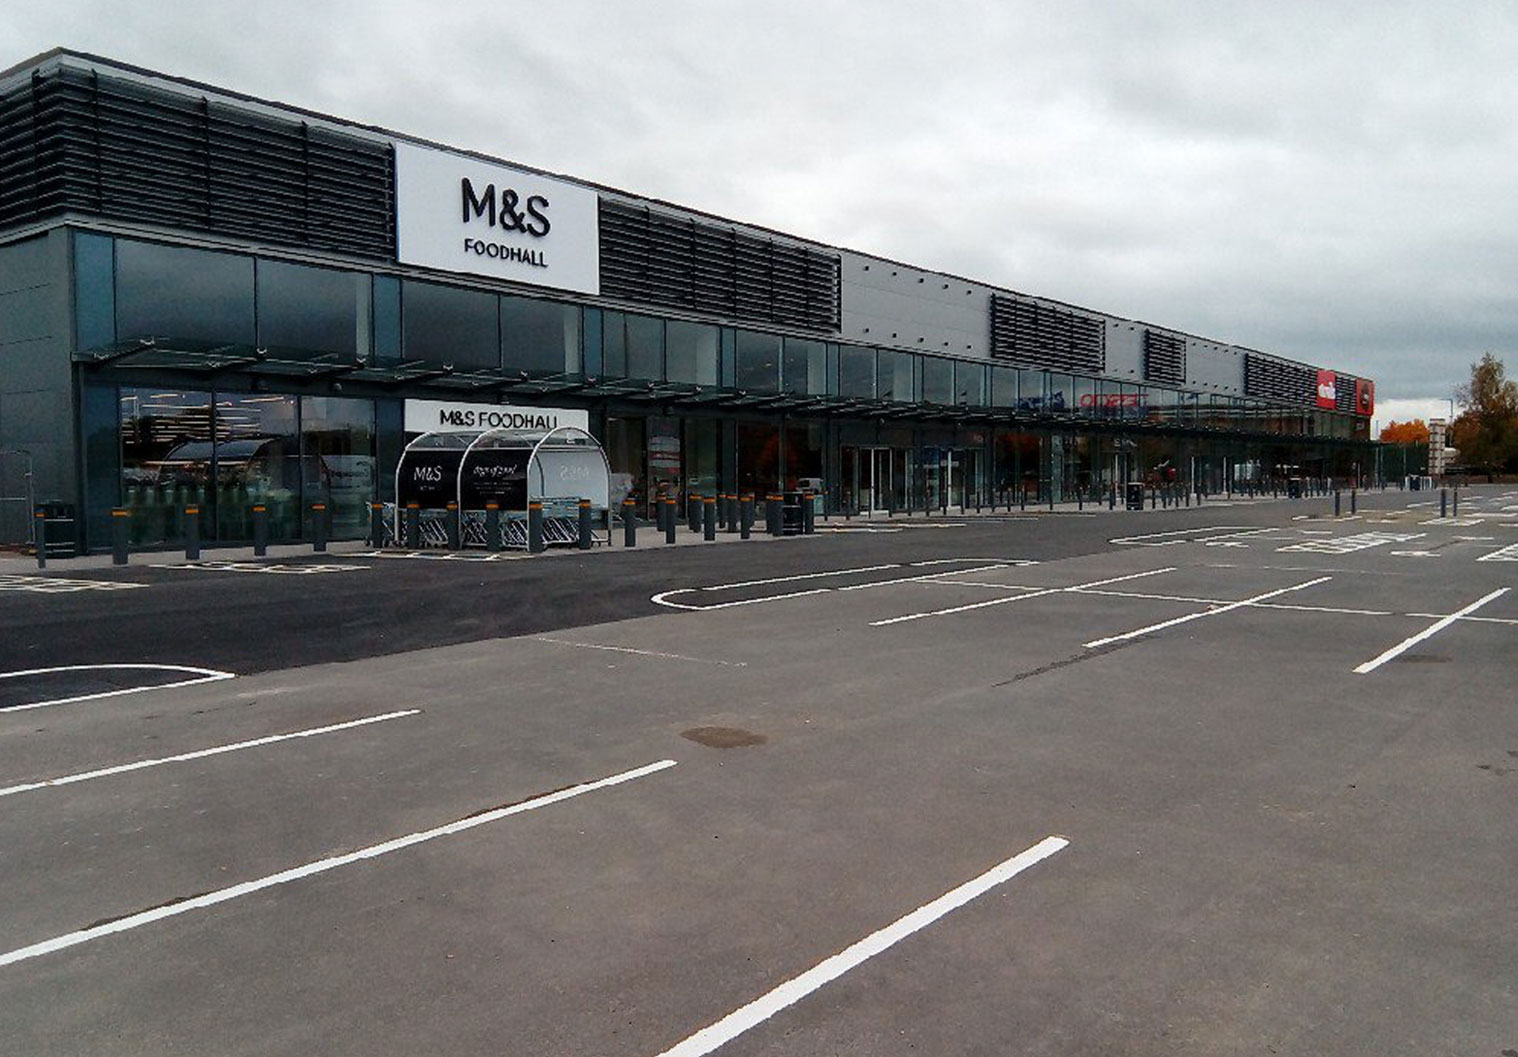 Marlborough Retail Park